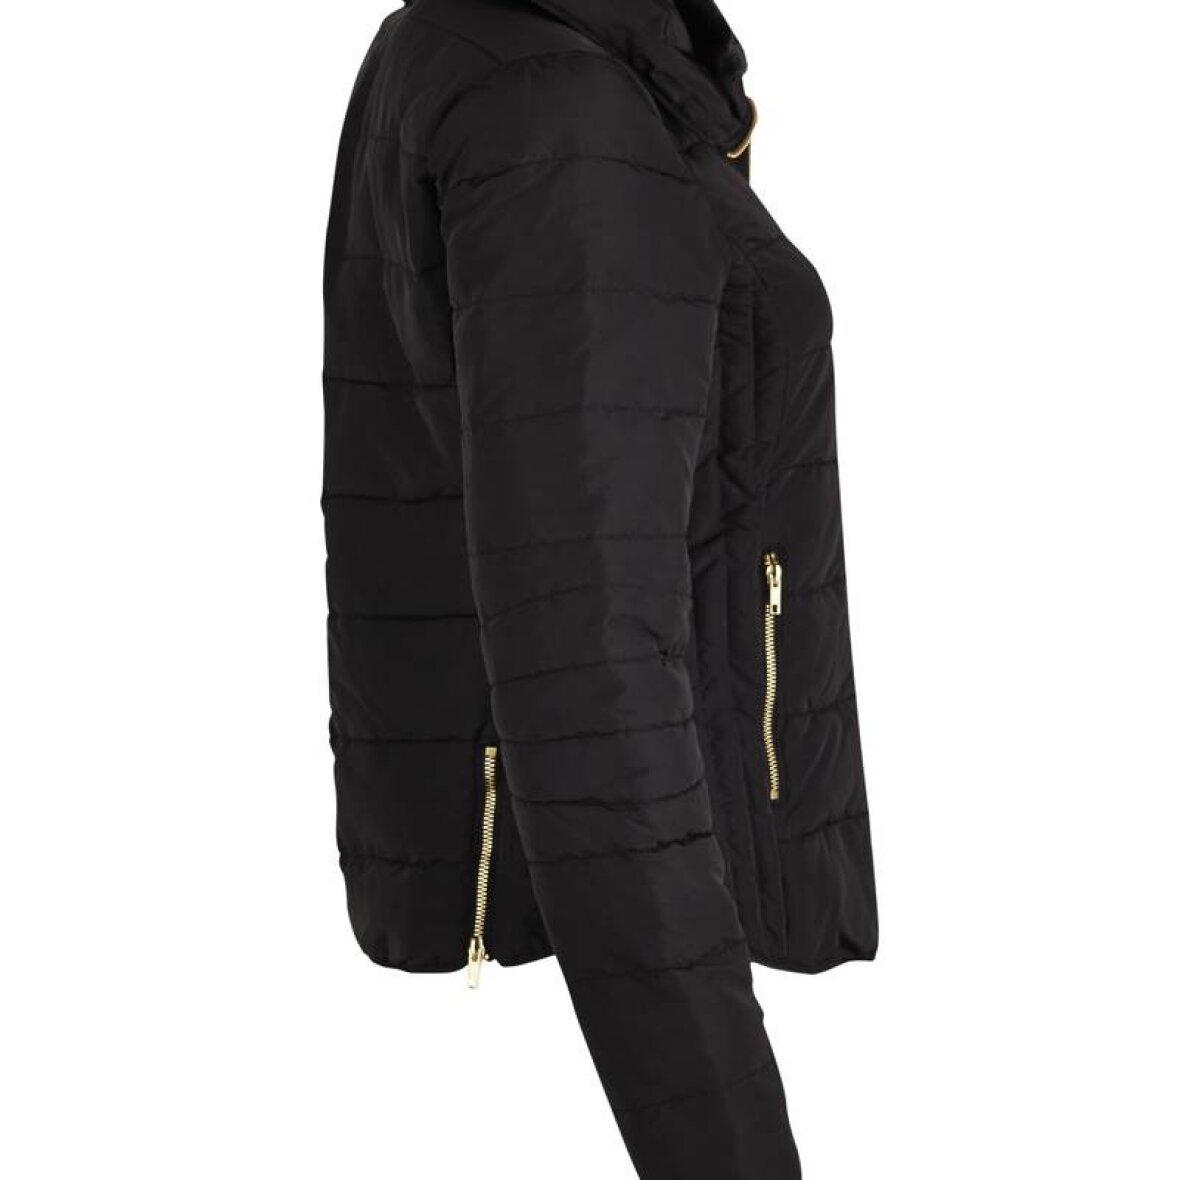 kort sort jakke